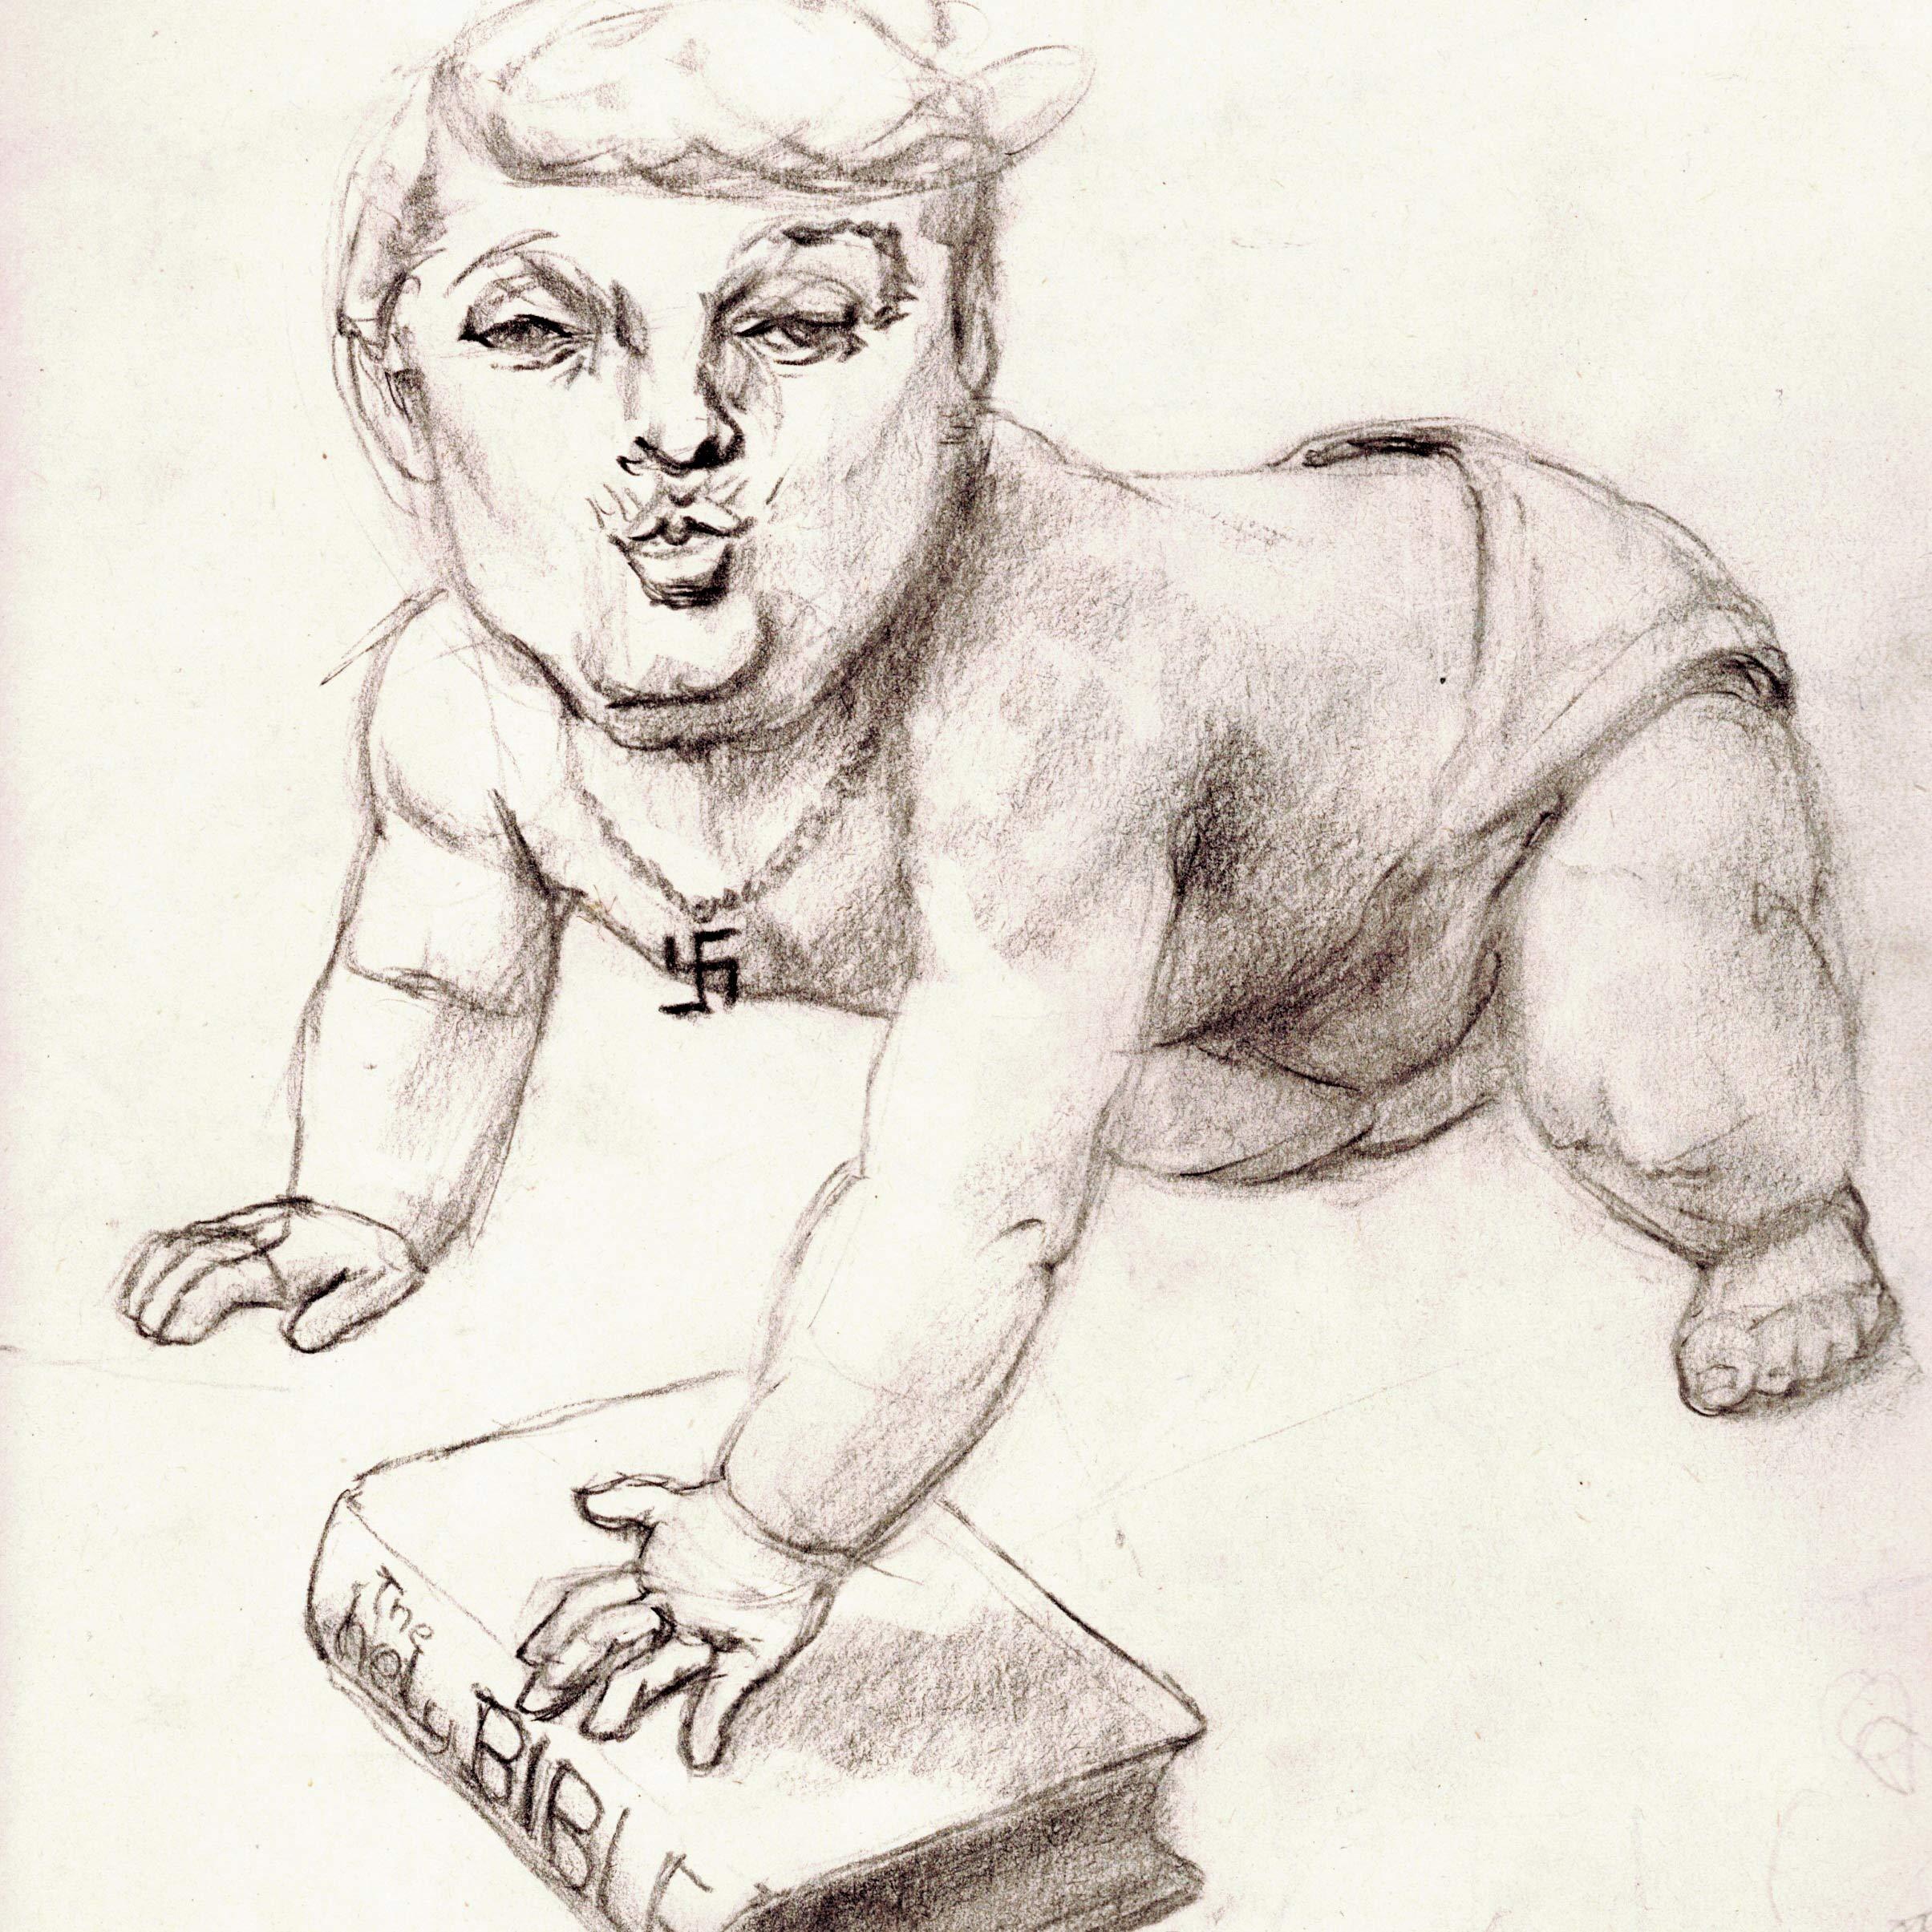 shame, shame on Trump - charcoal-drawing by cornelia es said